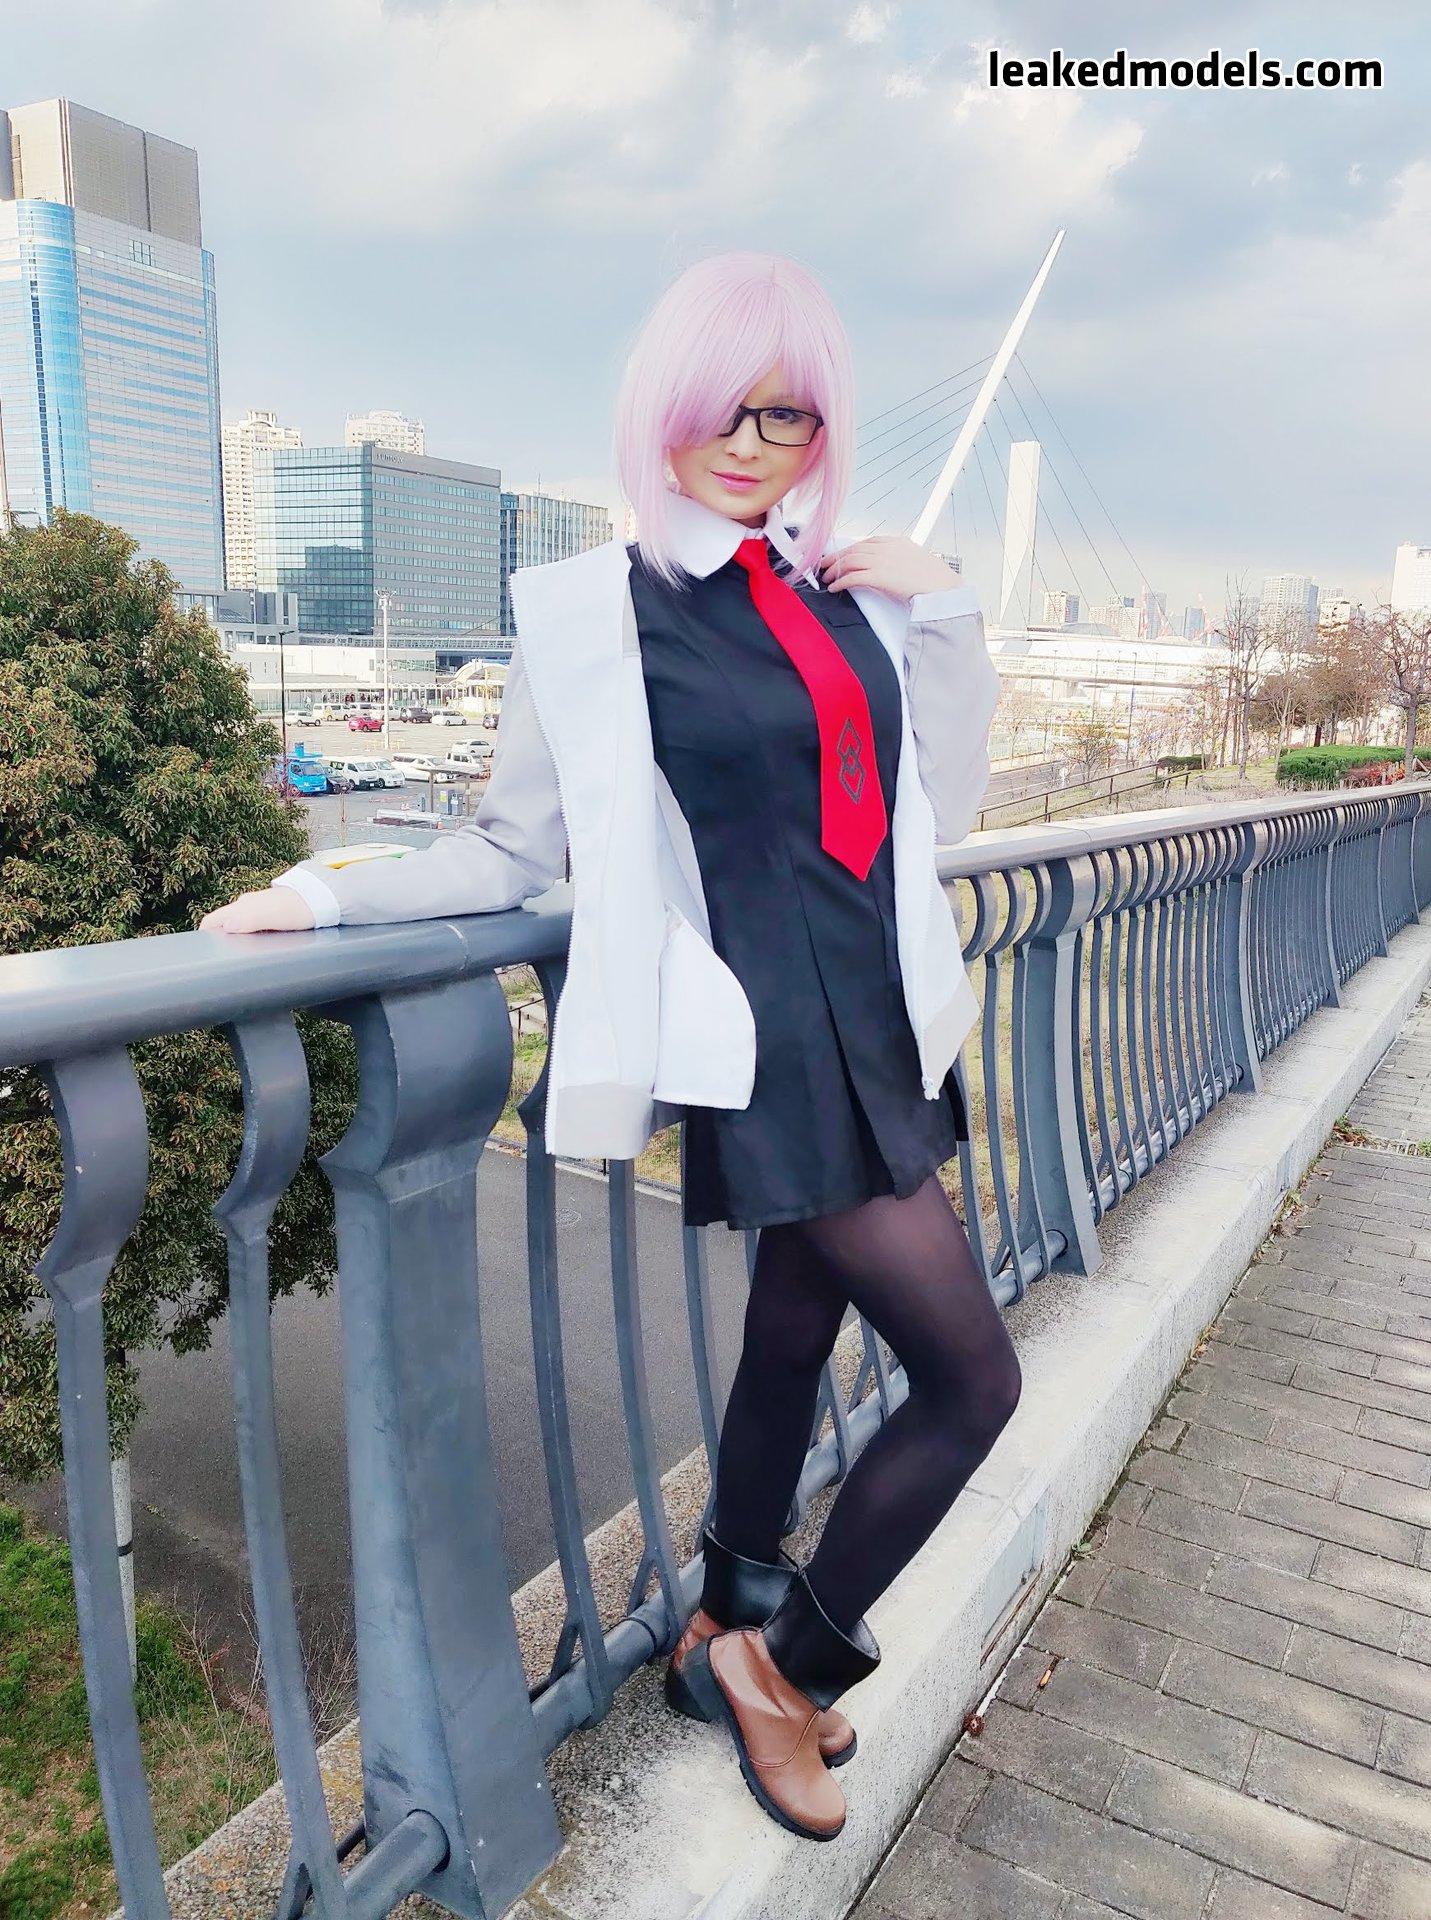 Hidori Rose – hidori_rose Patreon Sexy Leaks (37 Photos)